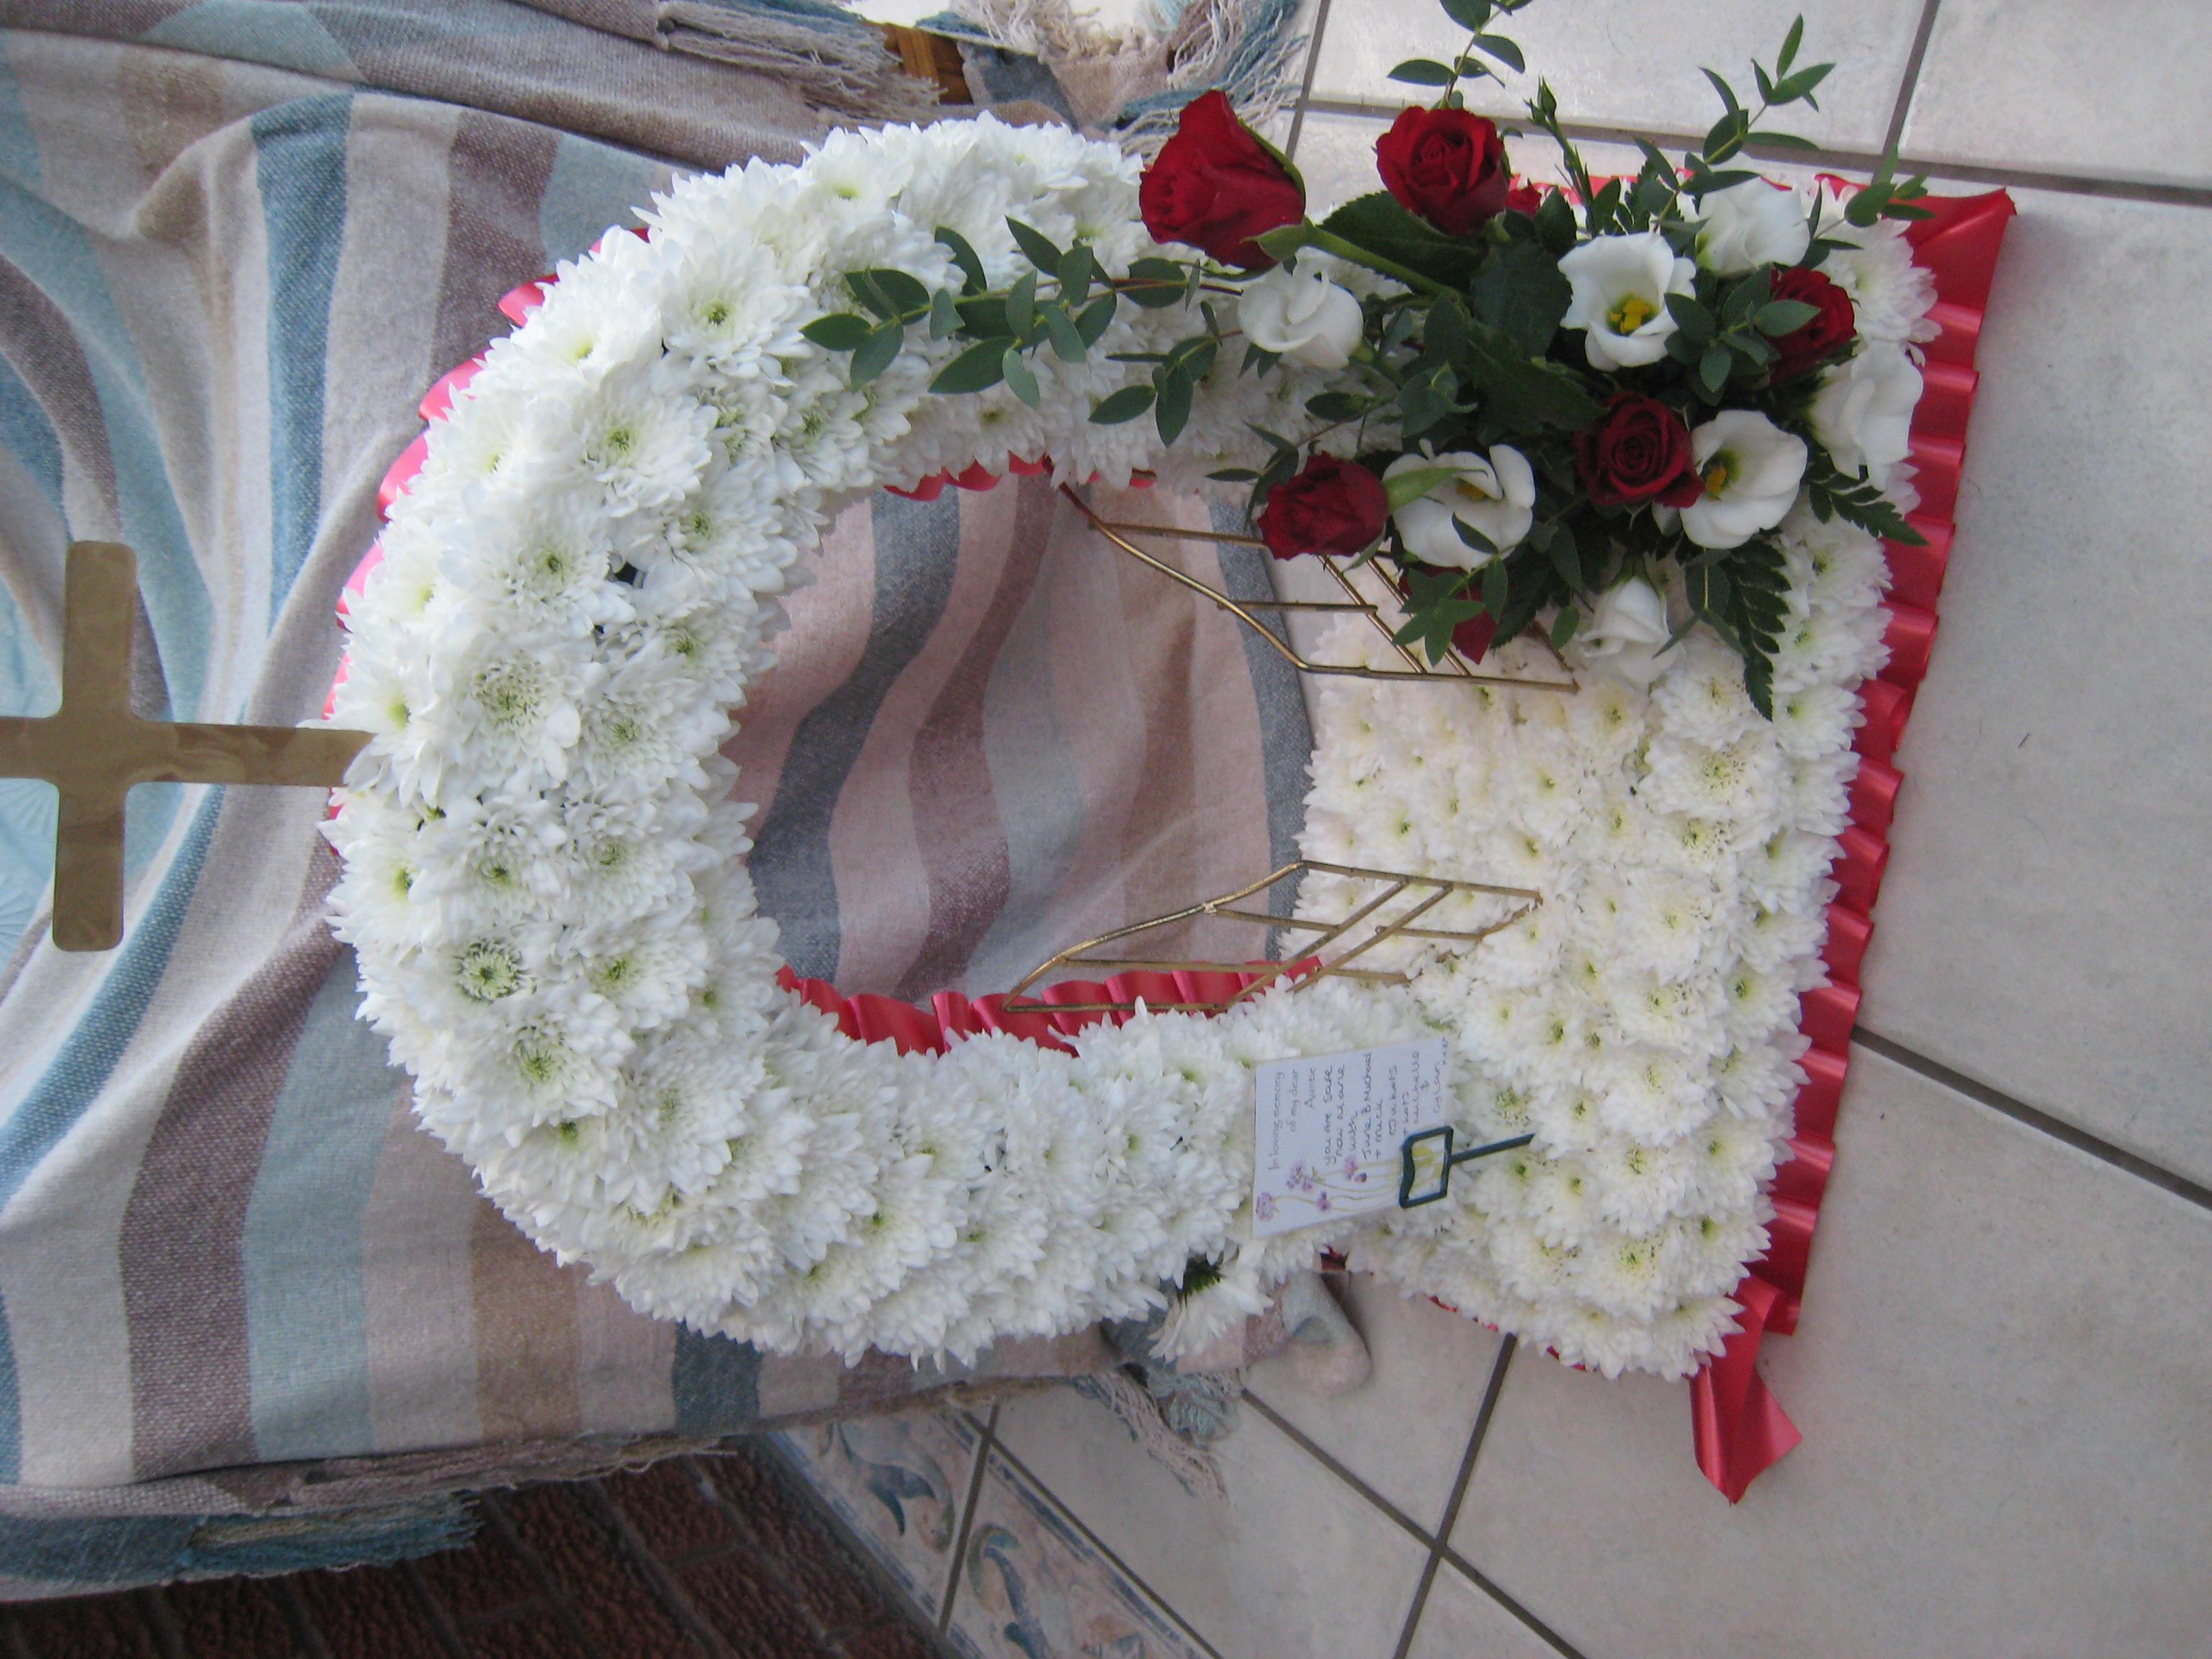 Jacaranda flowers special funeral tributes rabbit tribute izmirmasajfo Choice Image